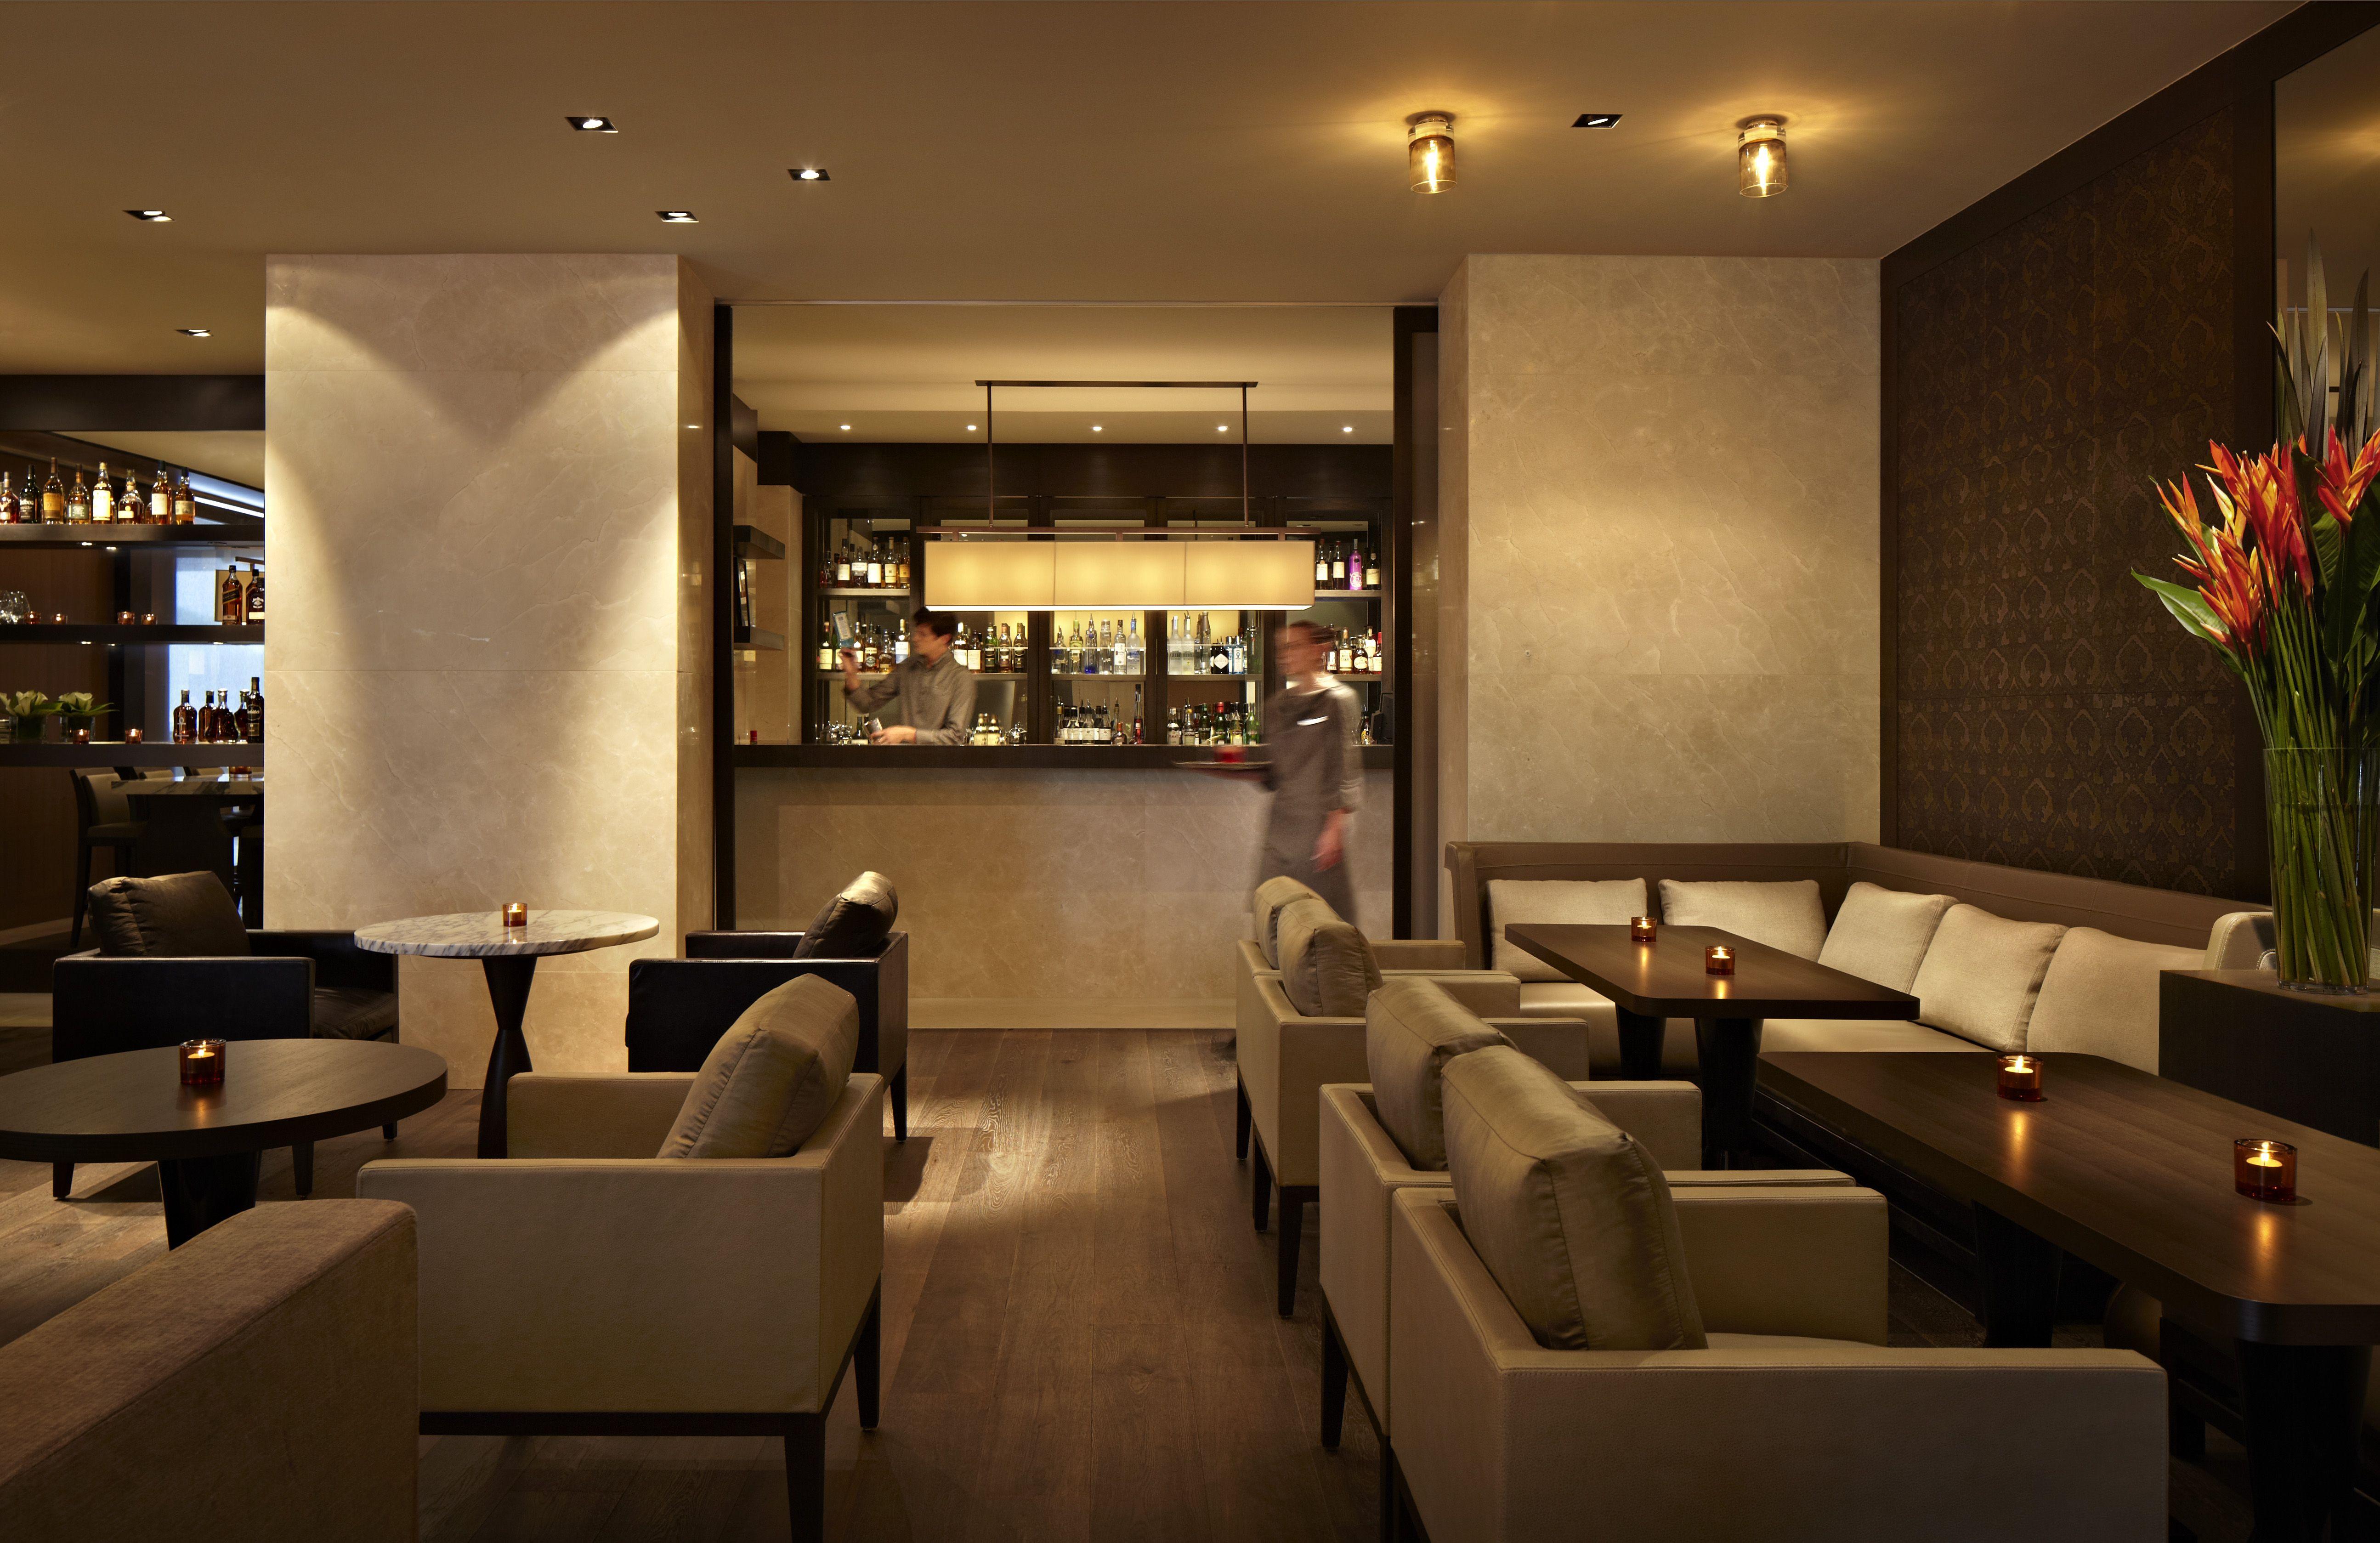 Have A Very Original Dinner At The Park Hyatt With Spectacular Endearing Park Hyatt Sydney Dining Room Review